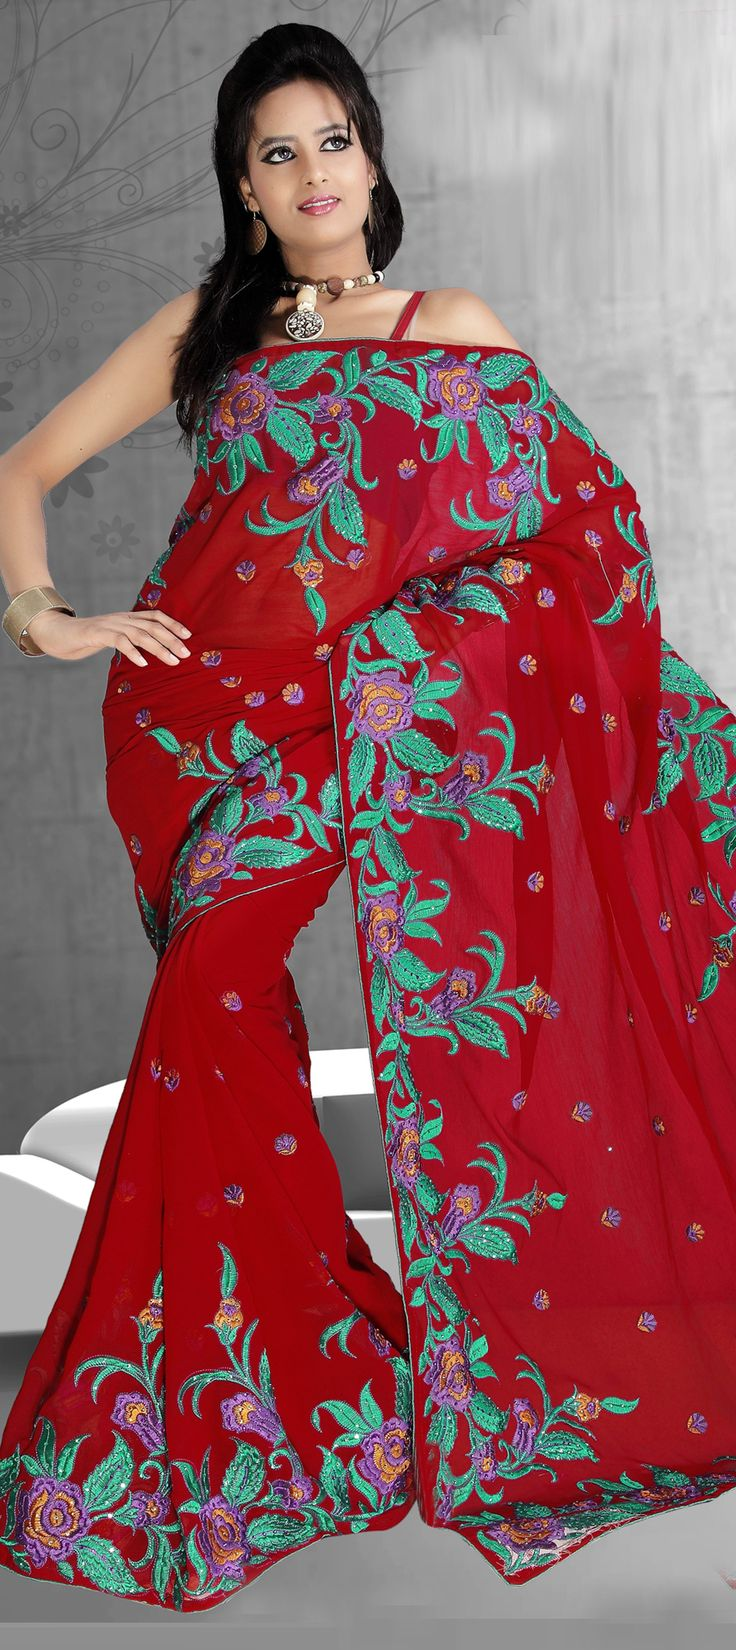 Sari - Indian Fashion